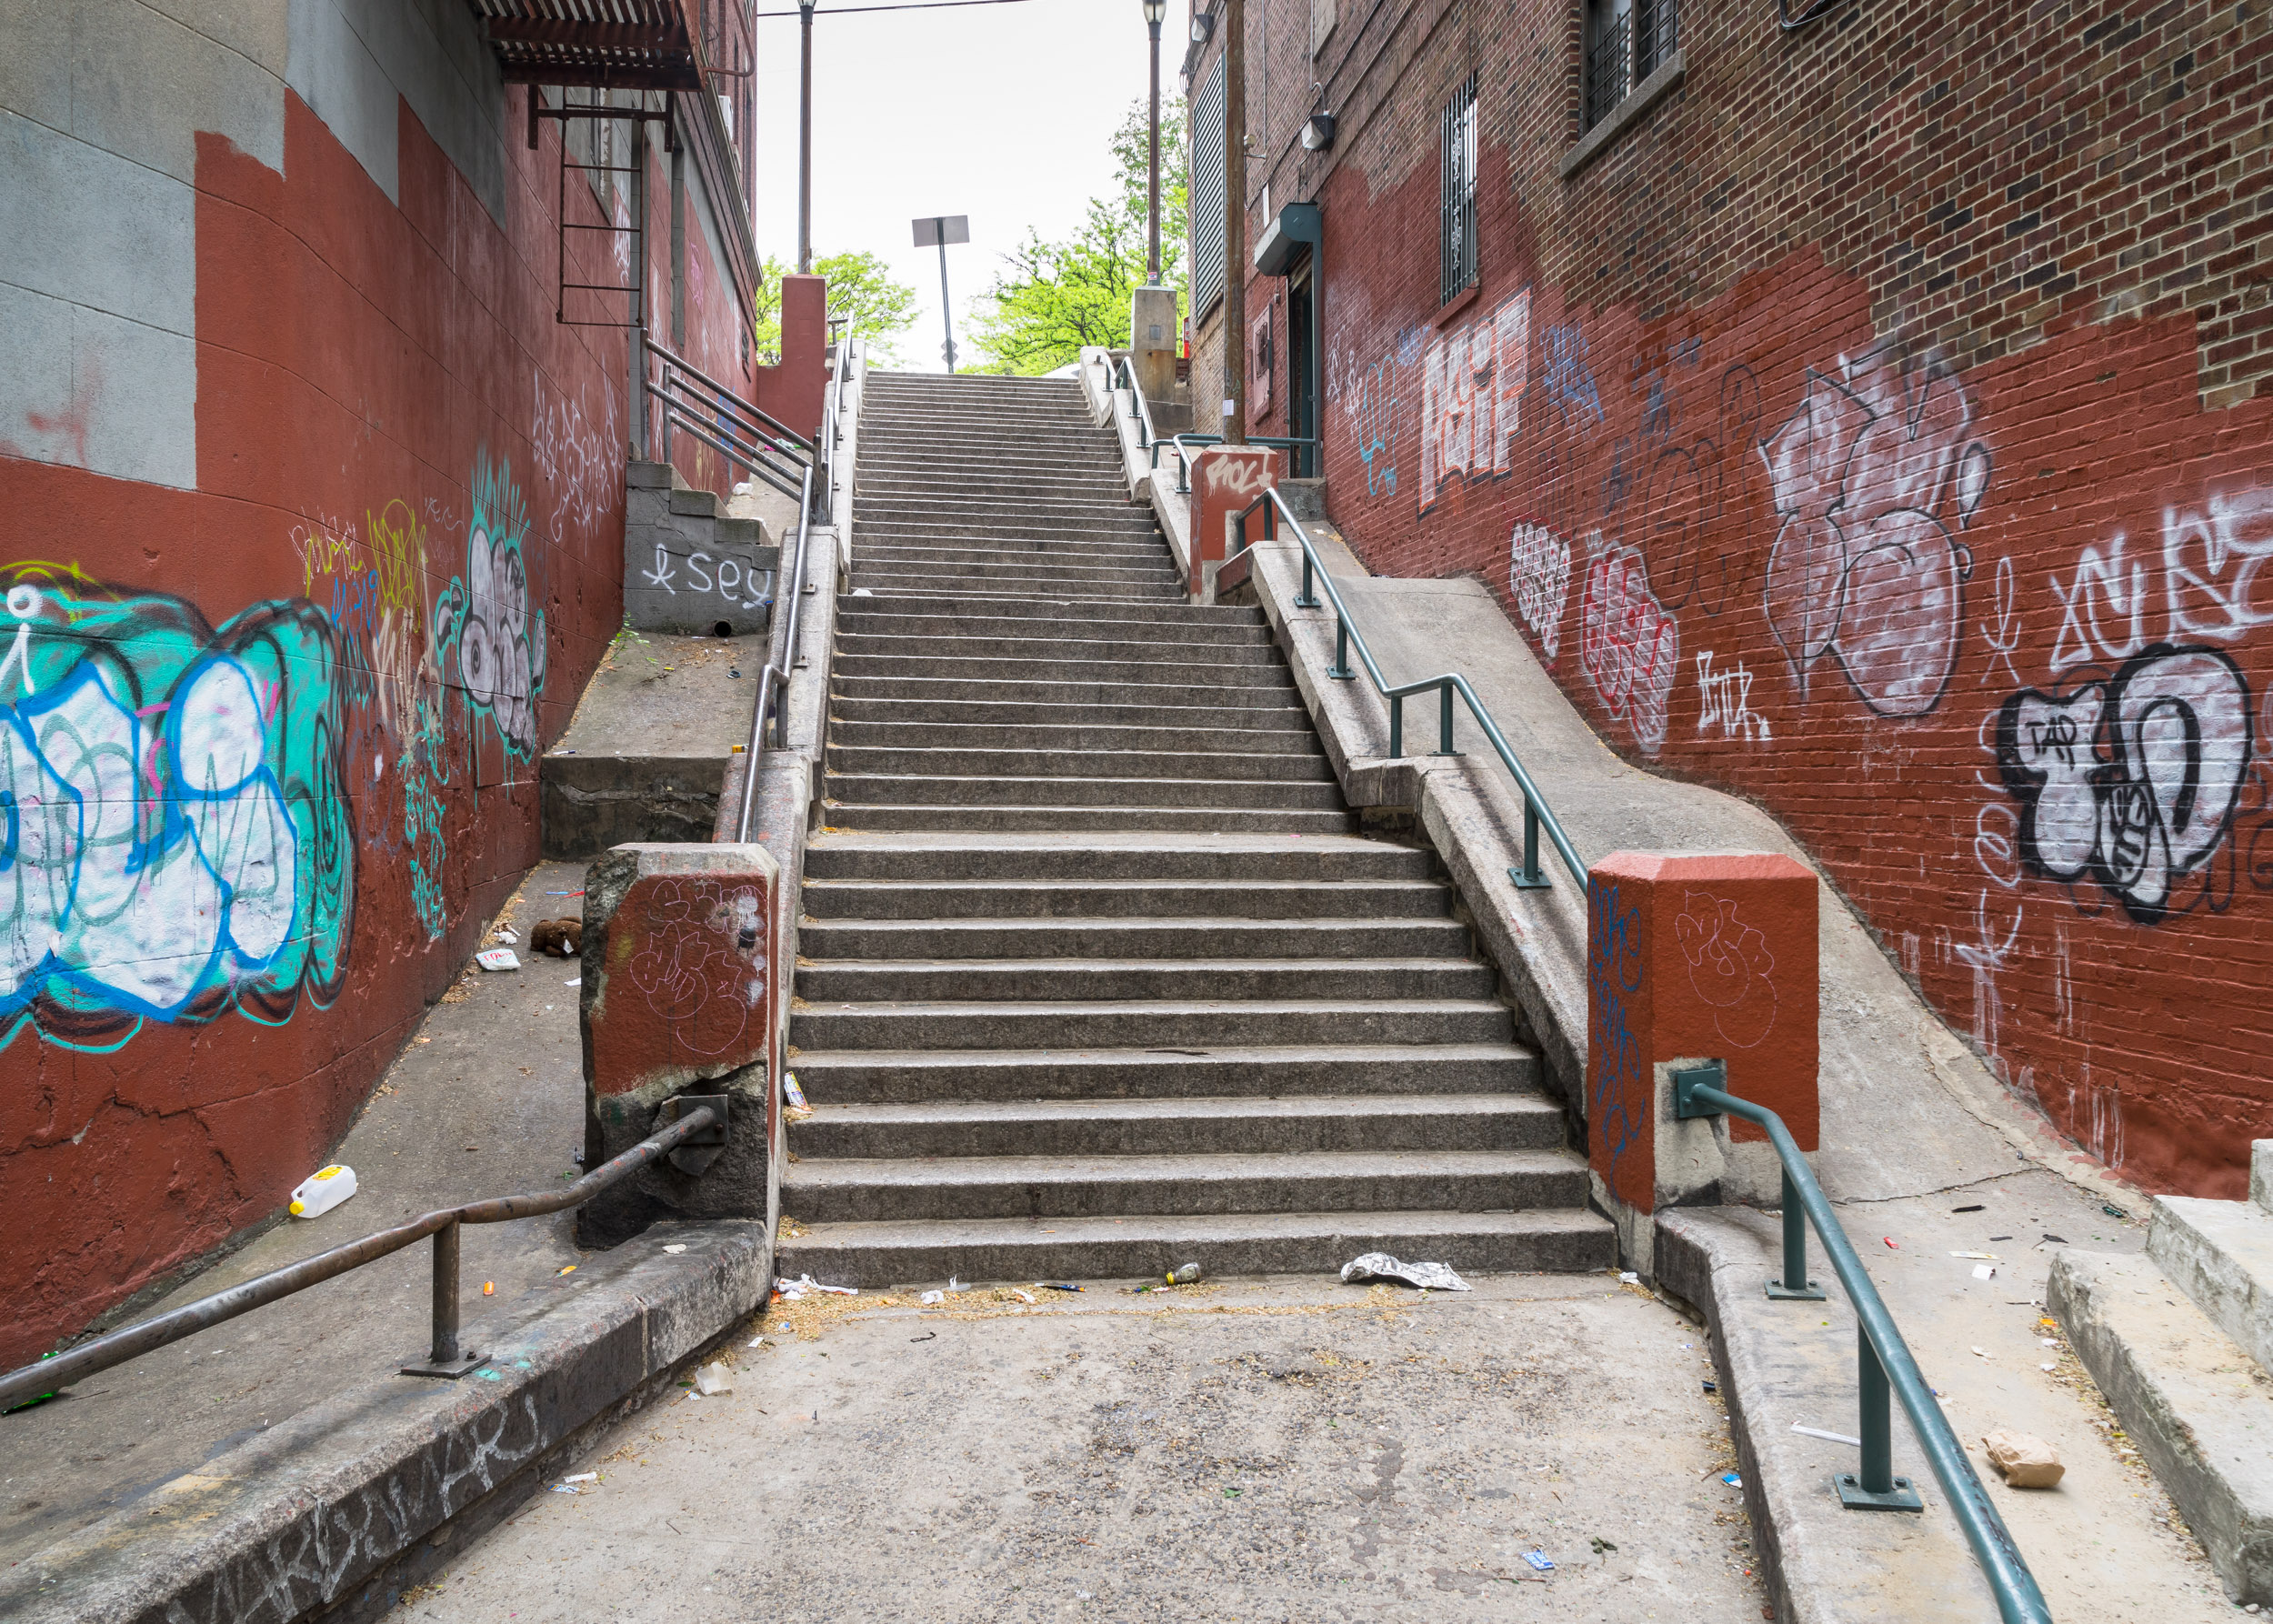 Bronx_kg033.jpg